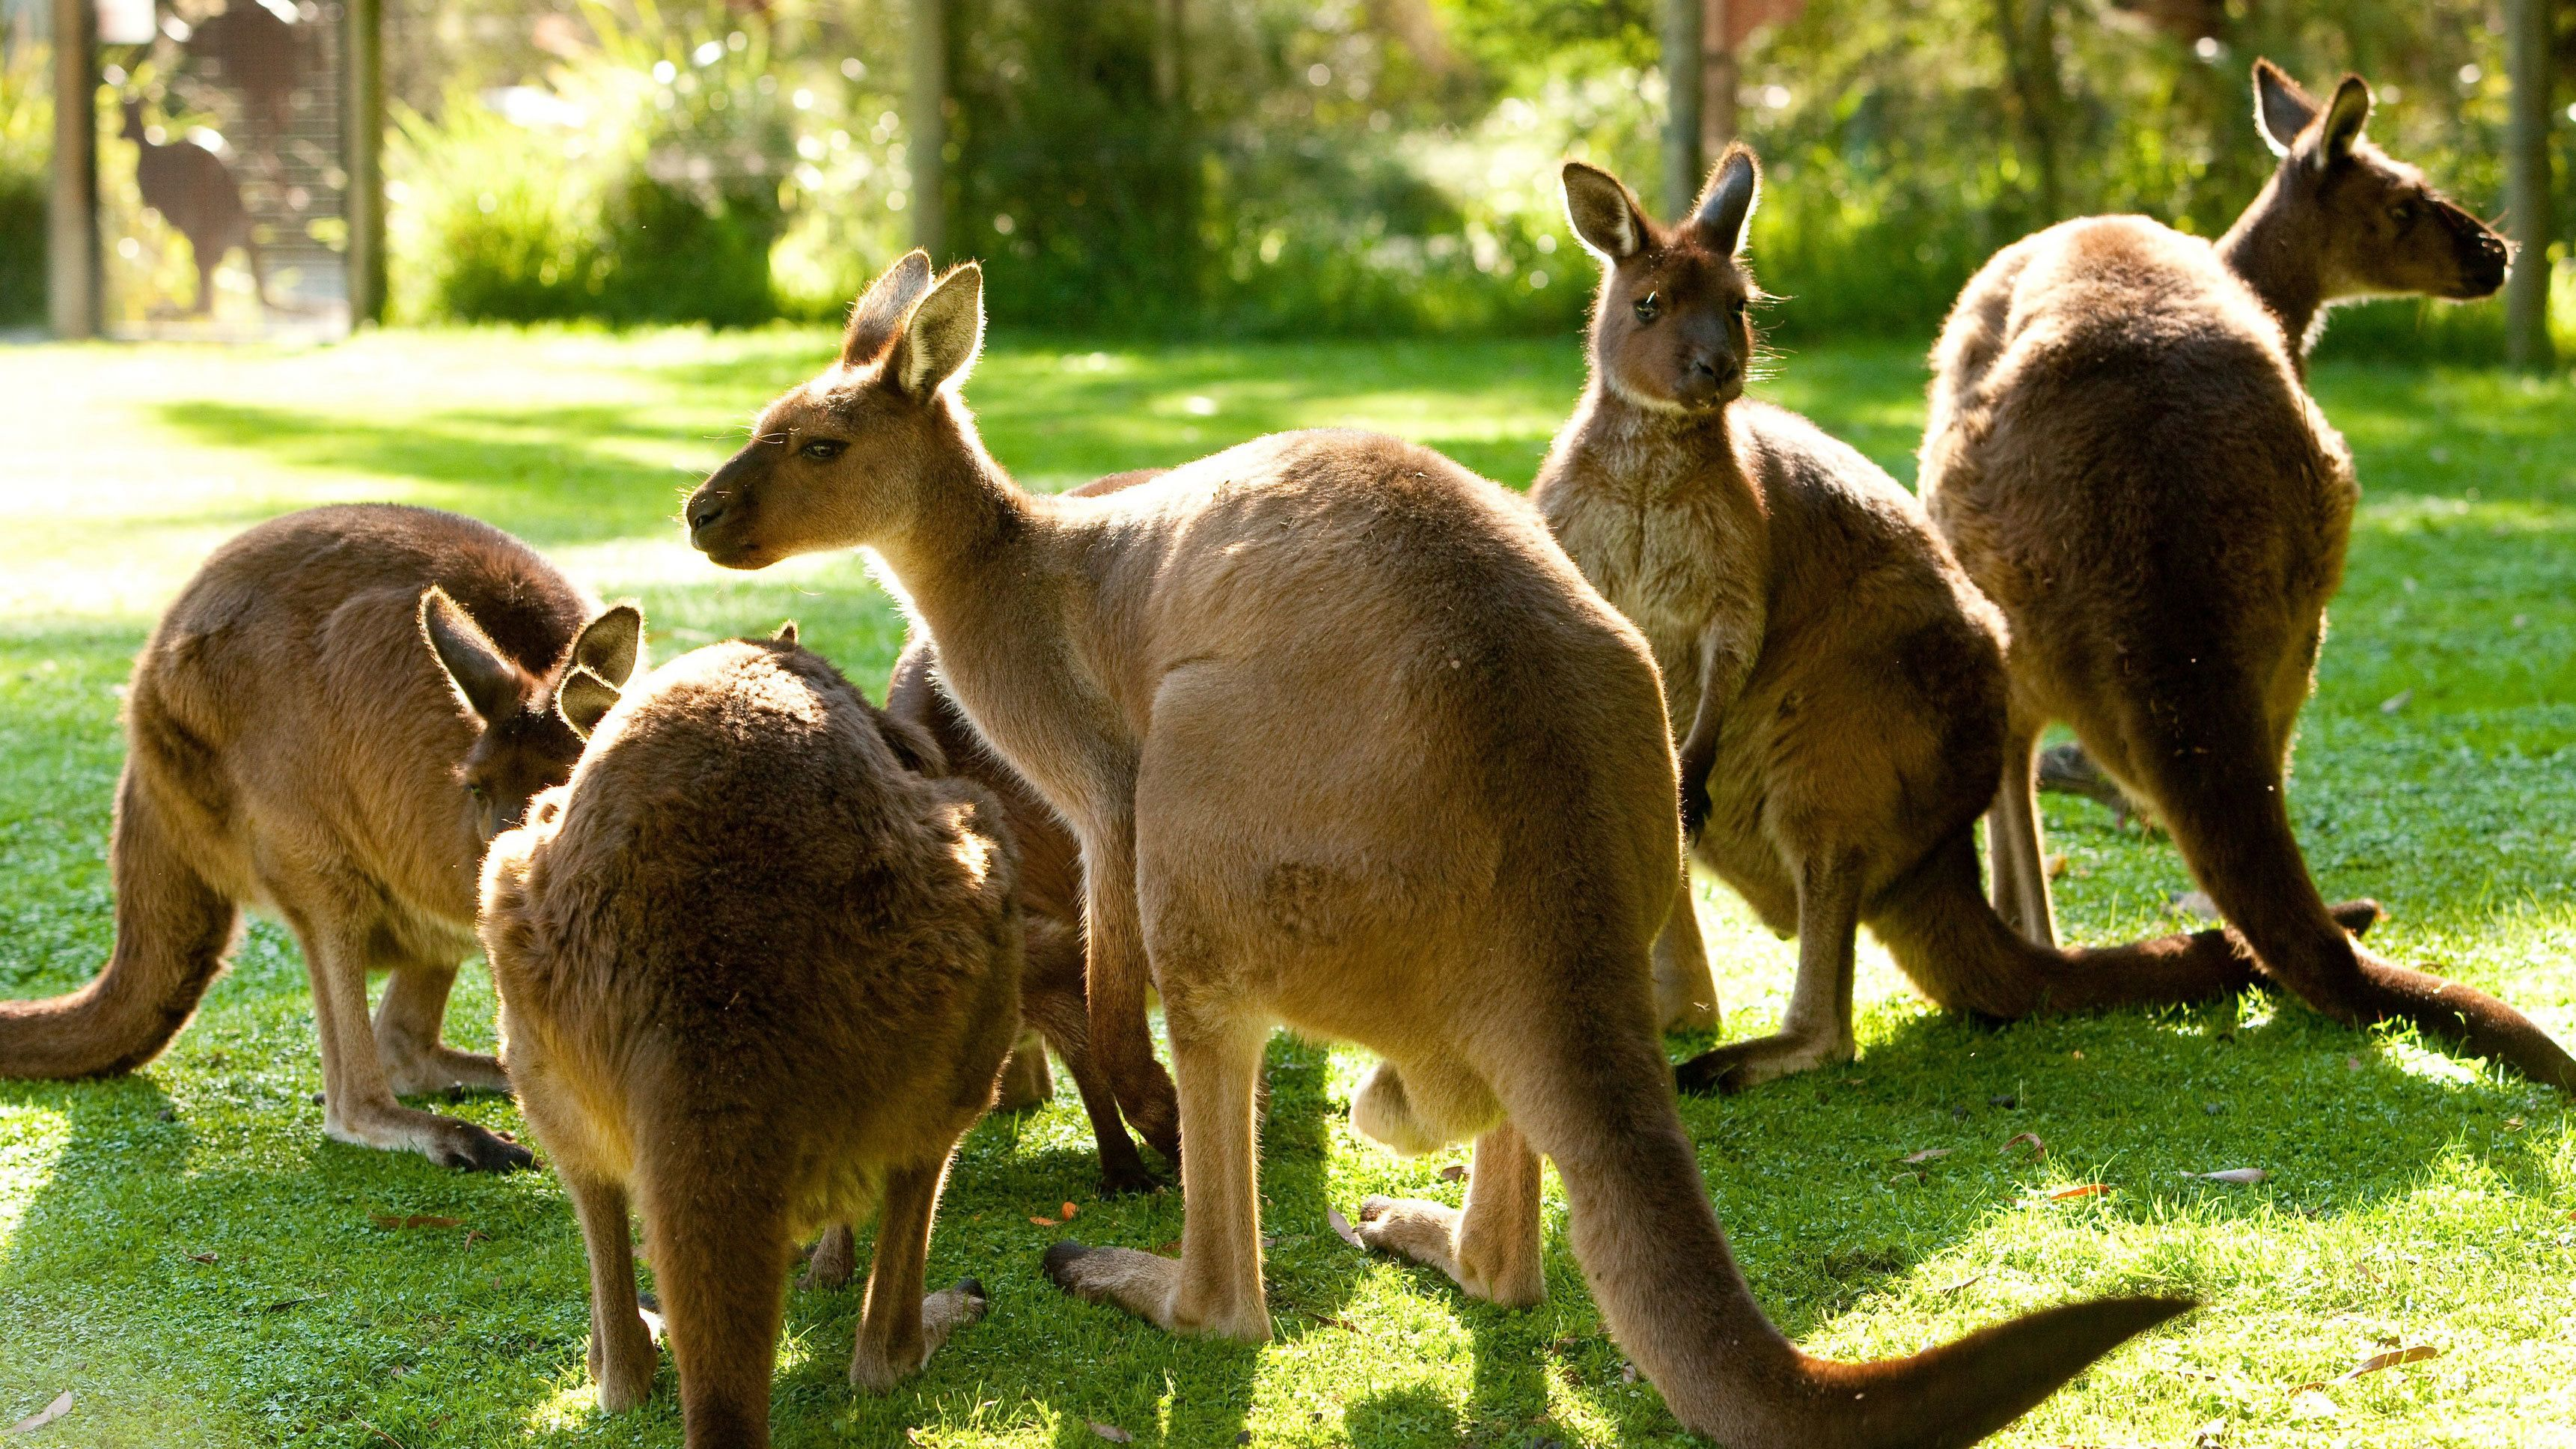 Group of kangaroos at Healesville Sanctuary